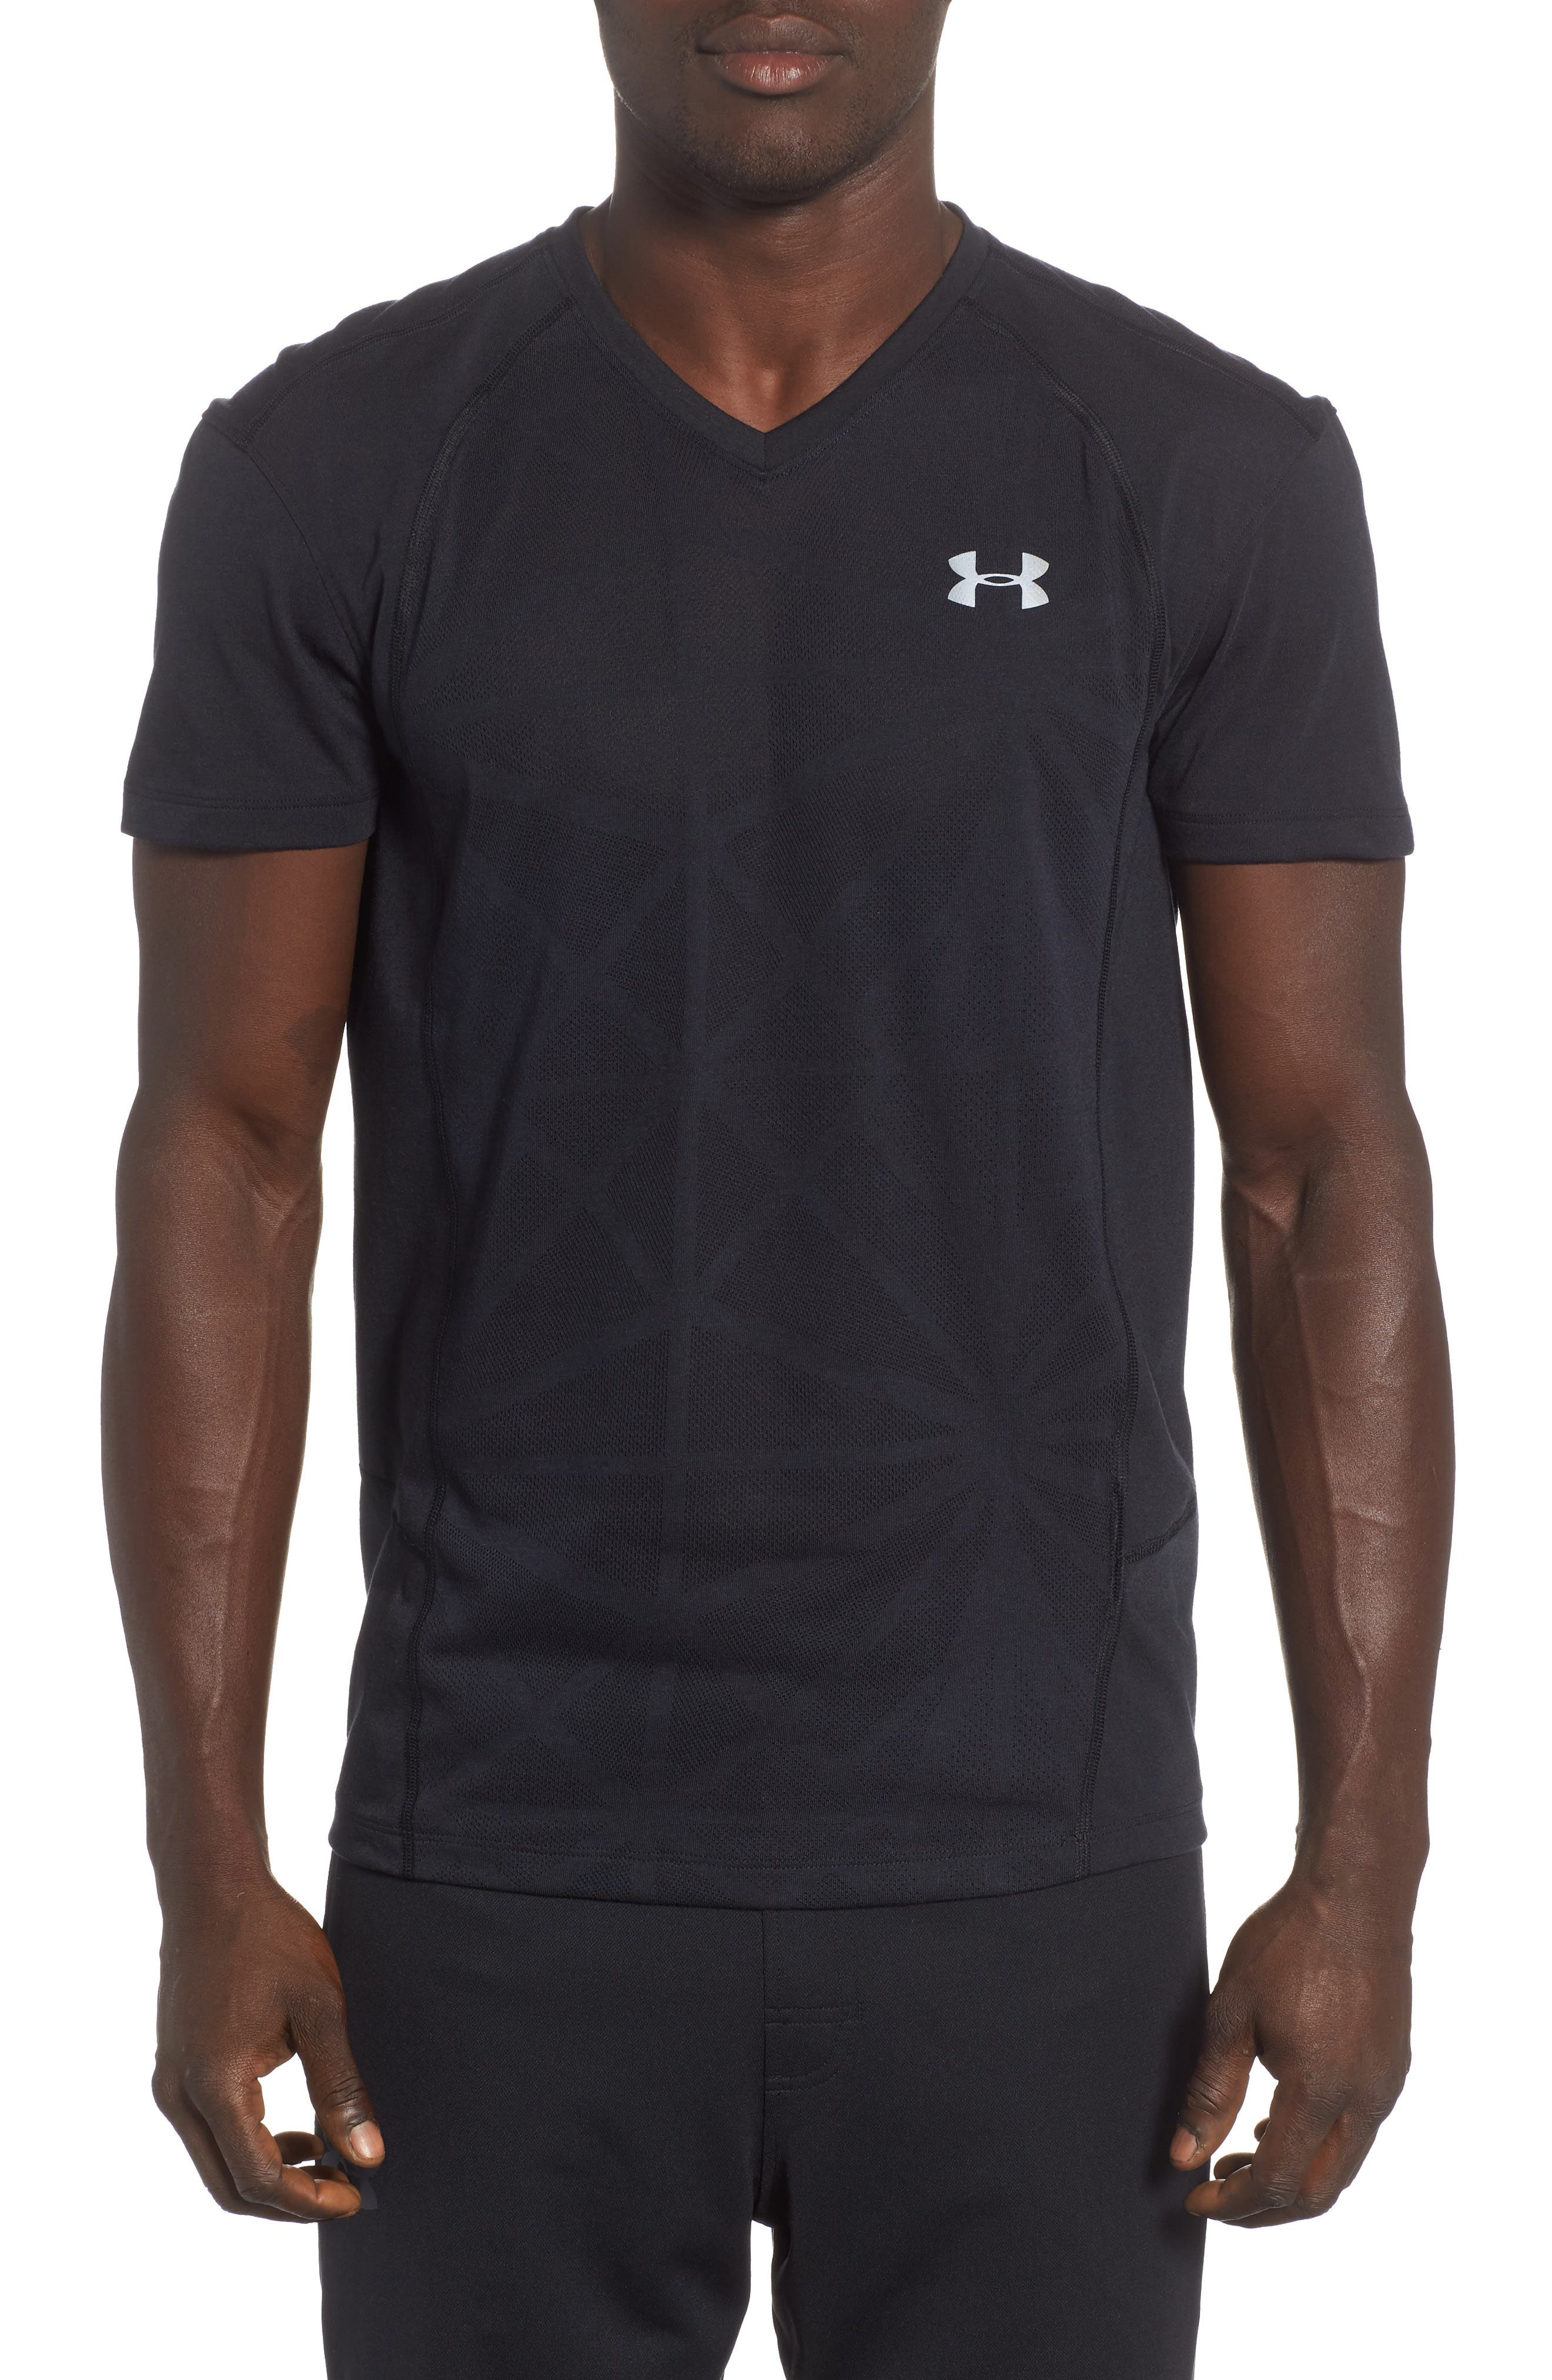 Microthread Swyft V-Neck T-Shirt,                         Main,                         color, BLACK/ BLACK/ REFLECTIVE